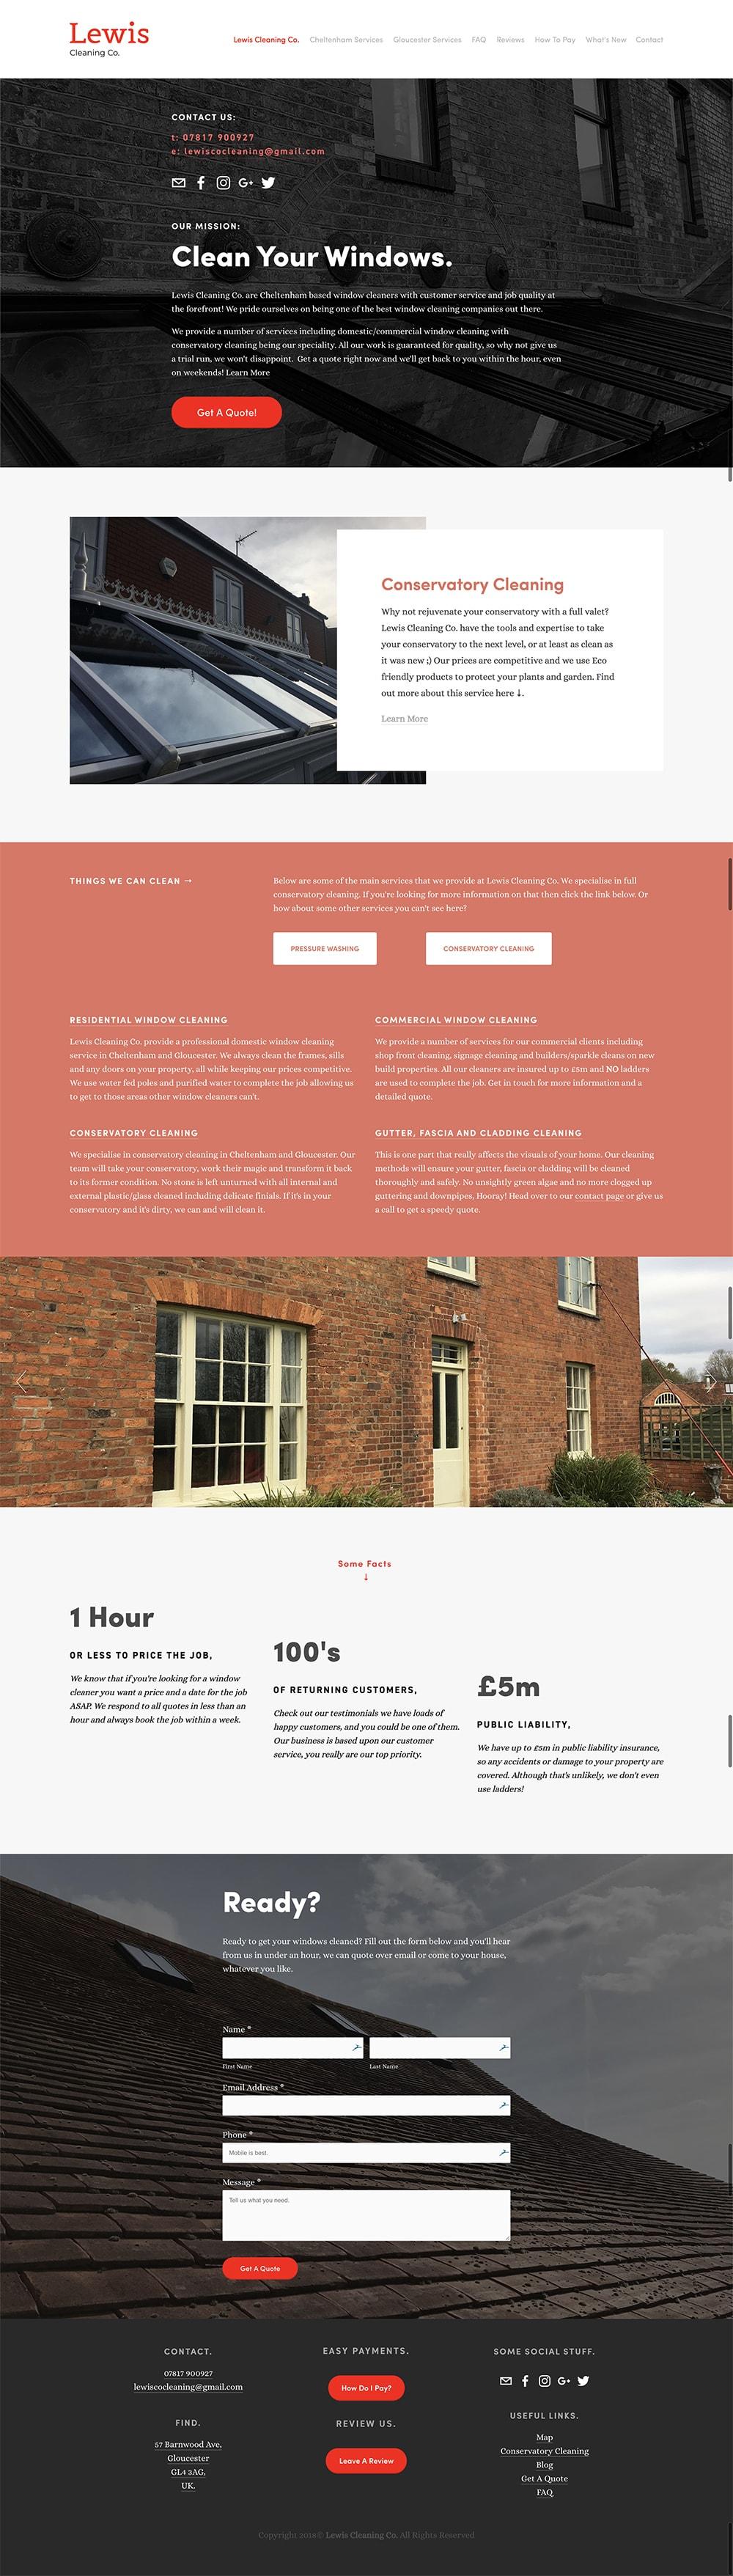 Lewis_cleaning_website_Window_Cleaning_Cheltenham.jpg